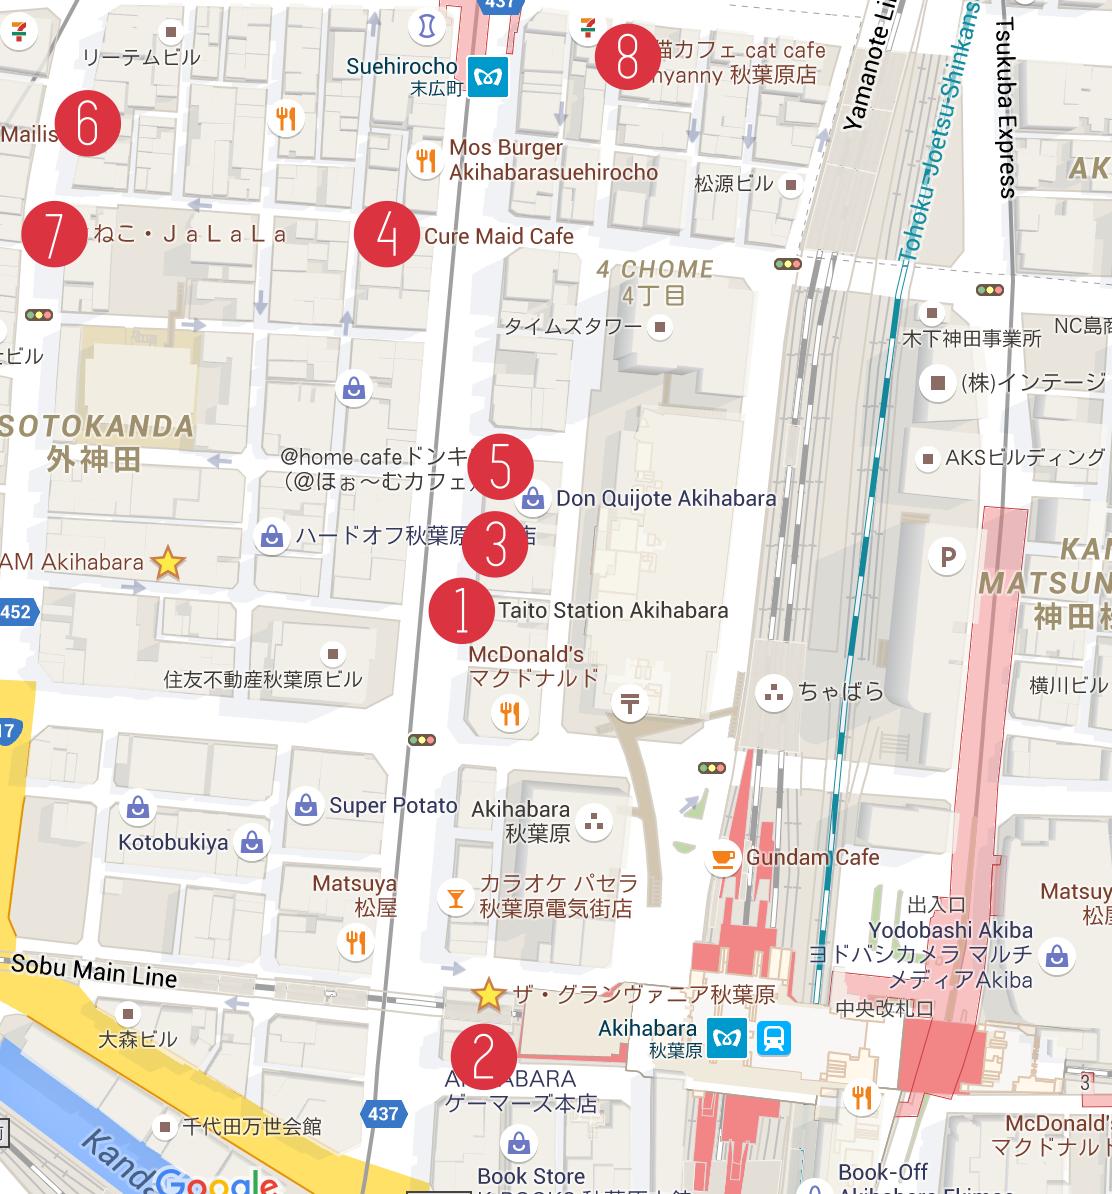 akihabara-map